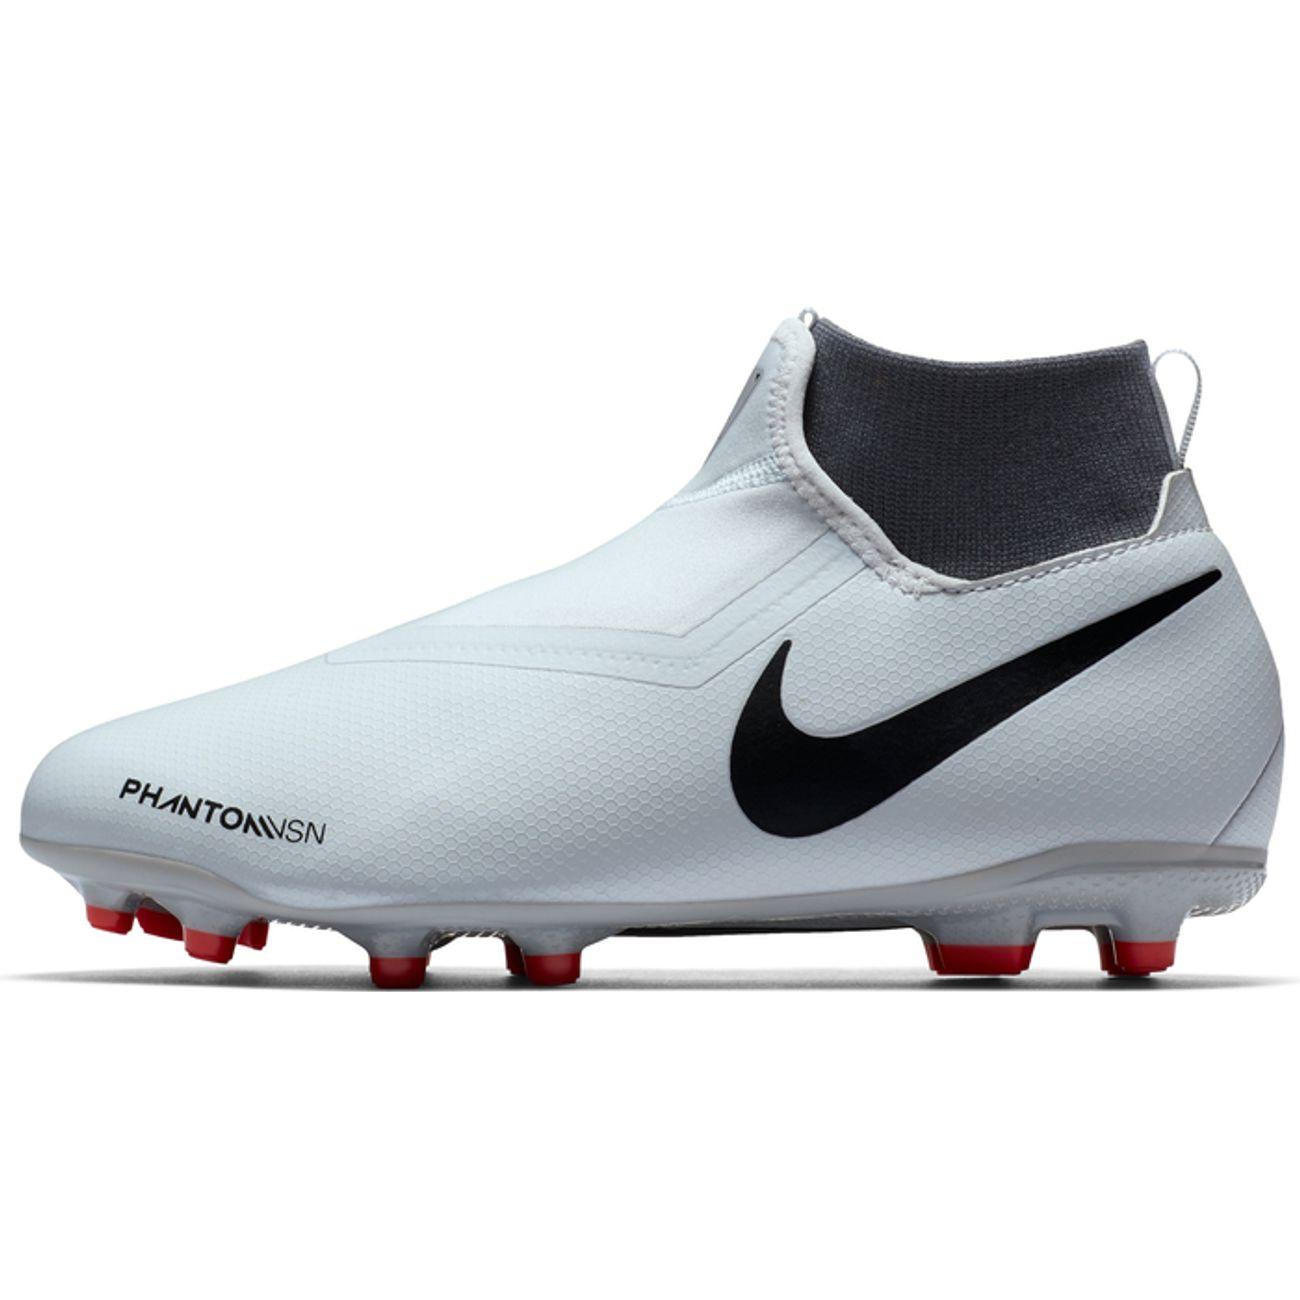 sports shoes 8e2d0 ba6a3 CHAUSSURES HAUTES Football junior NIKE JR OBRA 3 ACADEMY DF MG ...